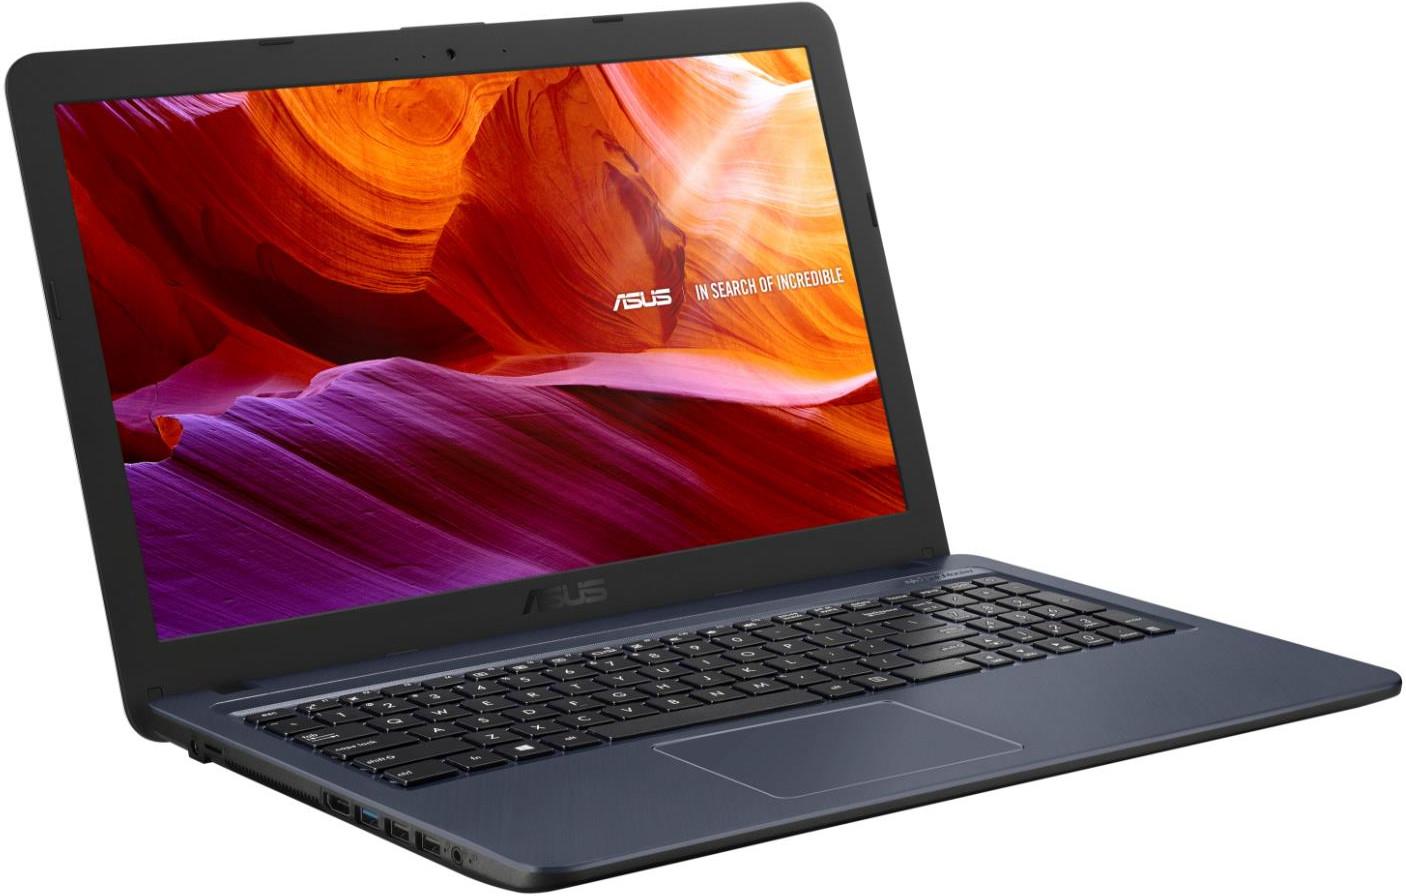 Asus VivoBook X543MA-DM673T